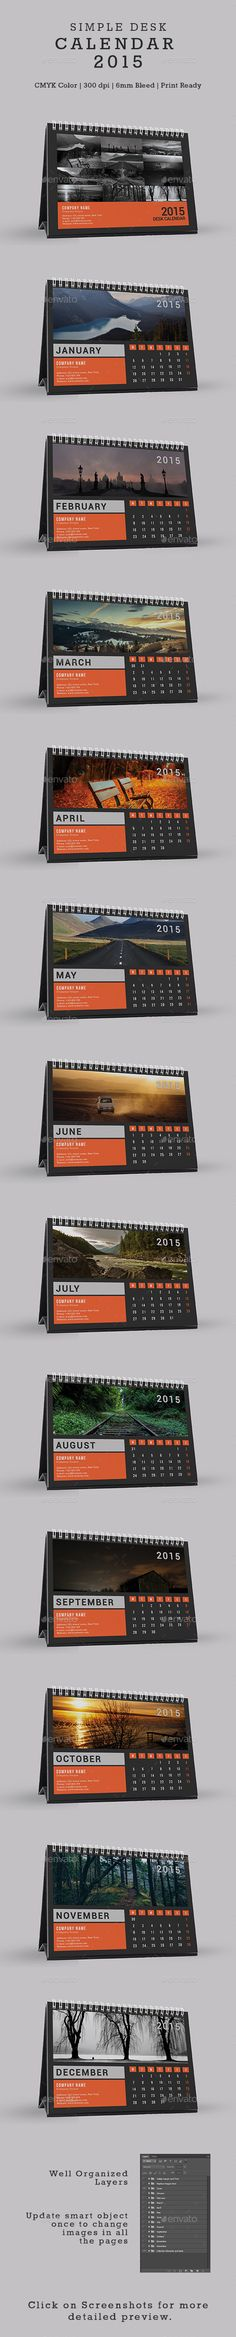 Simple Desk Calendar 2015 Template | Buy and Download: http://graphicriver.net/item/simple-desk-calendar-2015/9902552?ref=ksioks